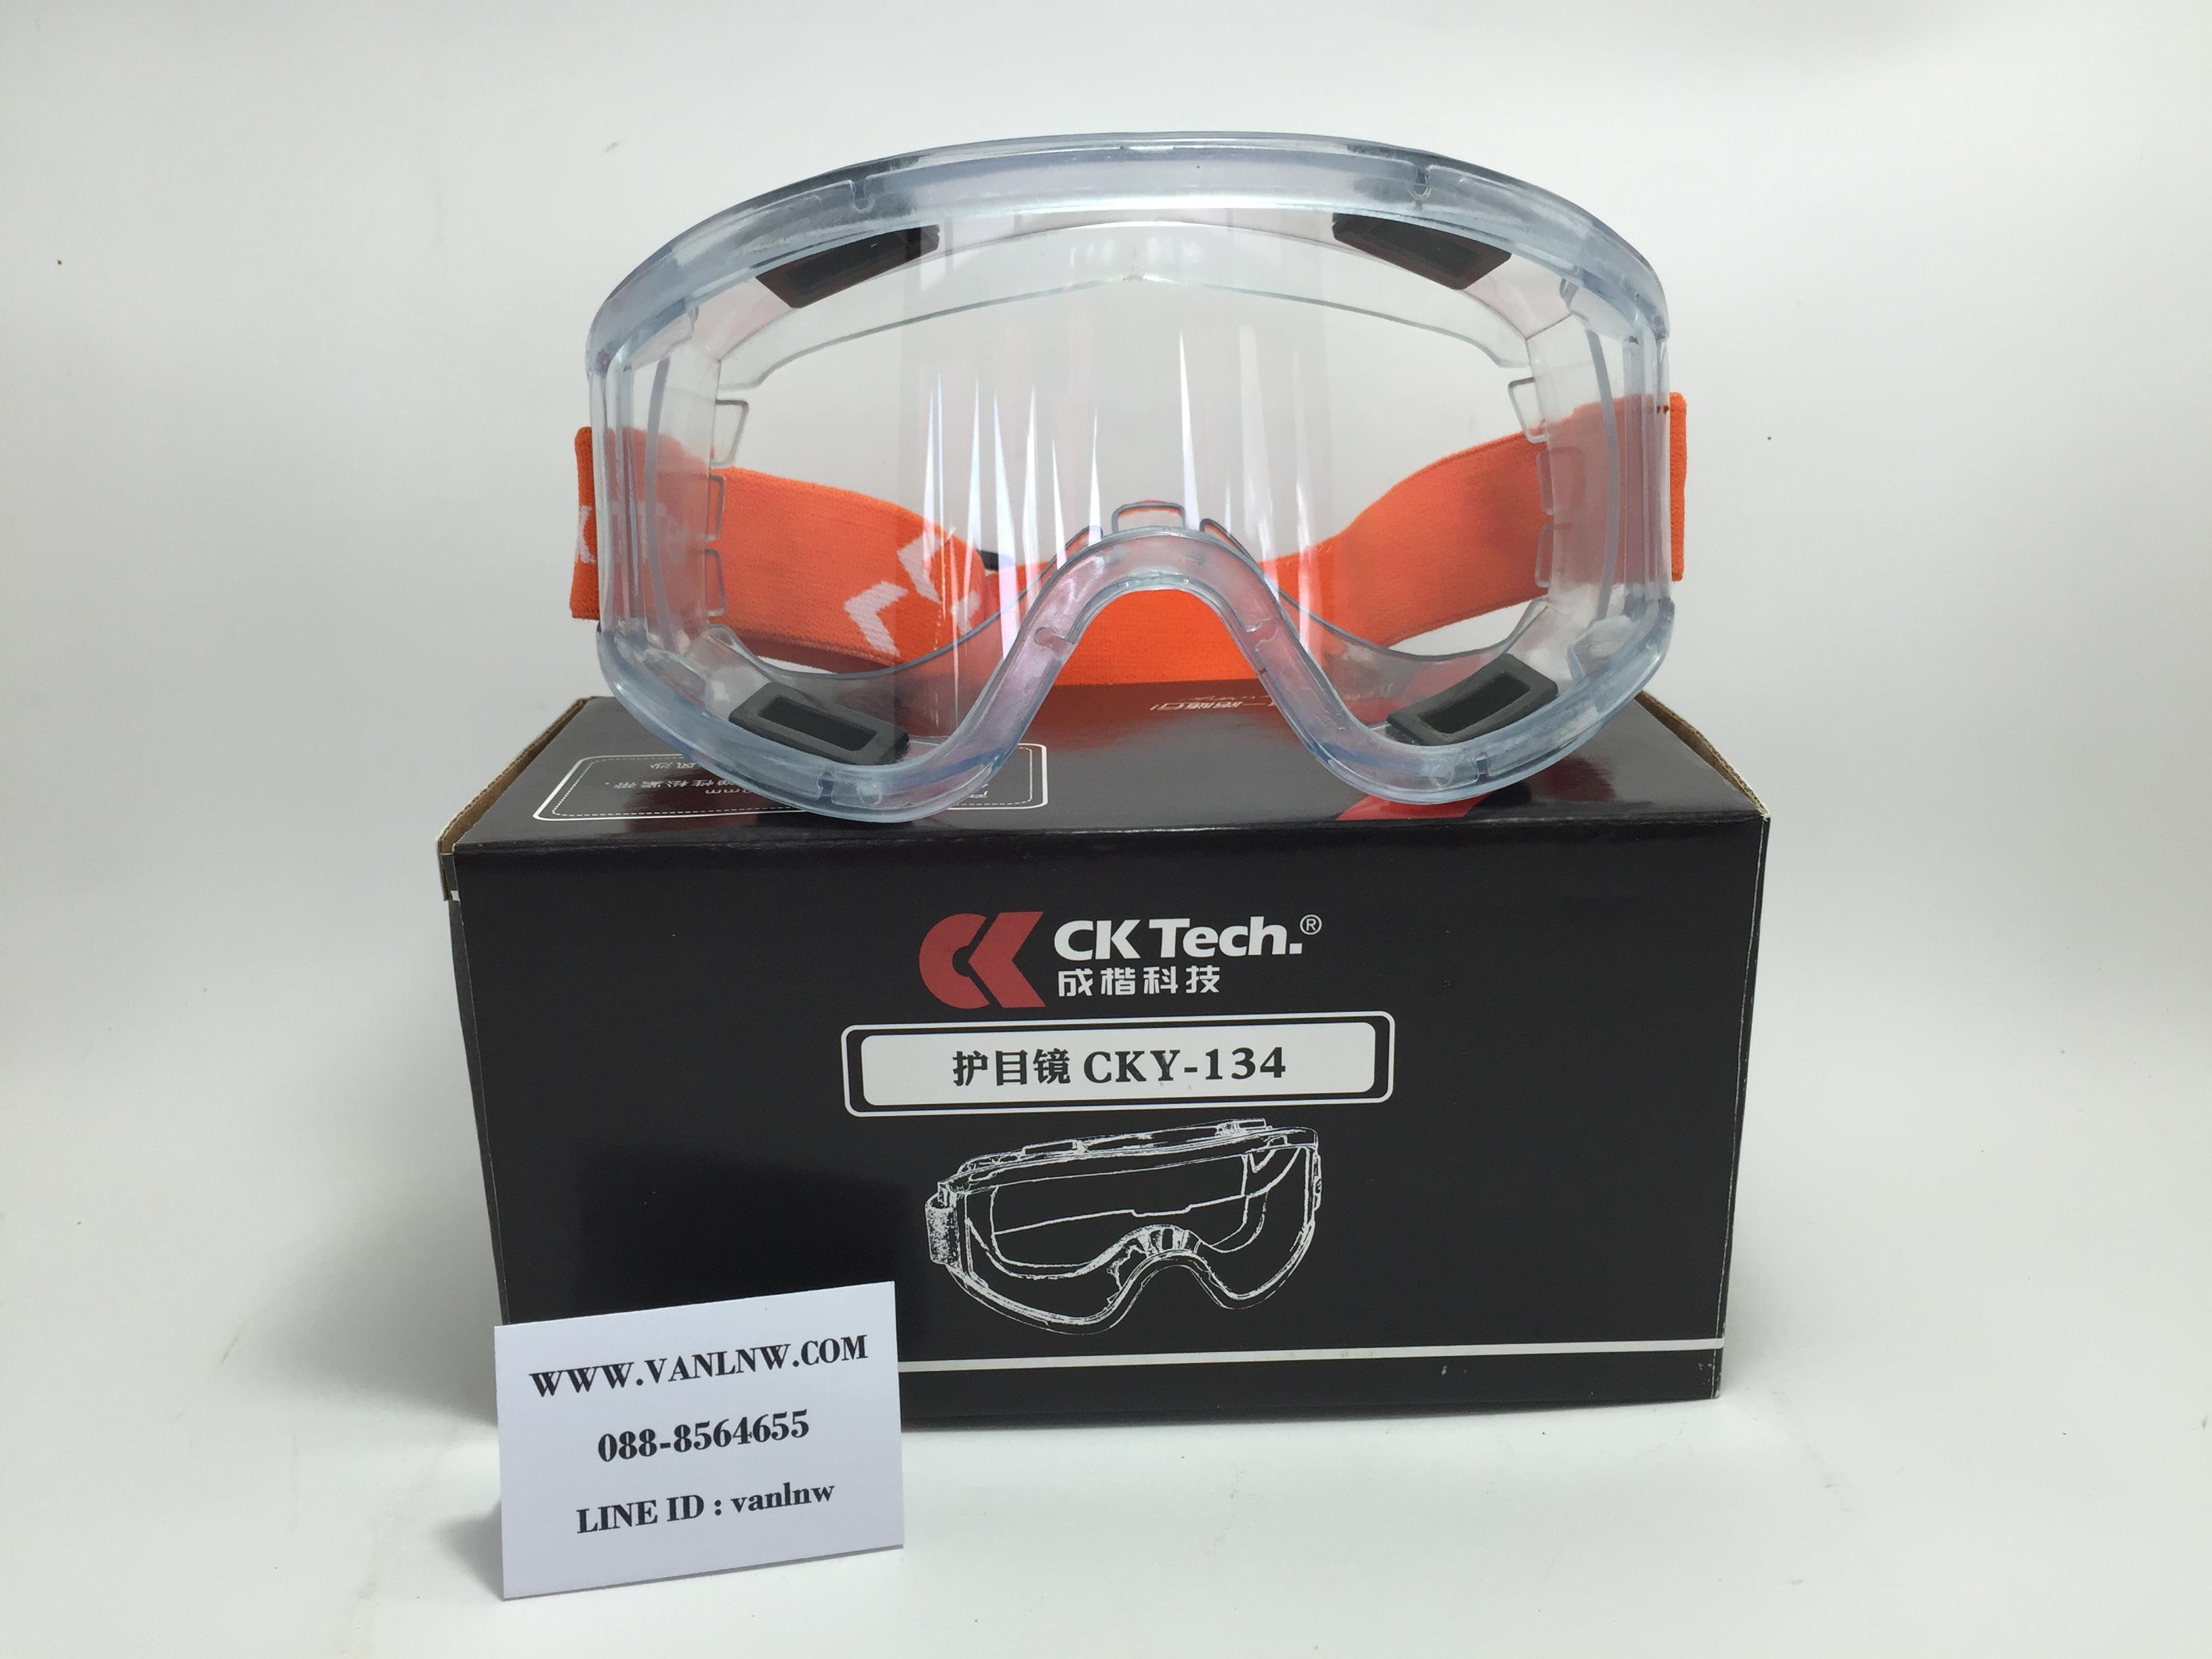 EXTREME CK Tech CKY-134 < White >